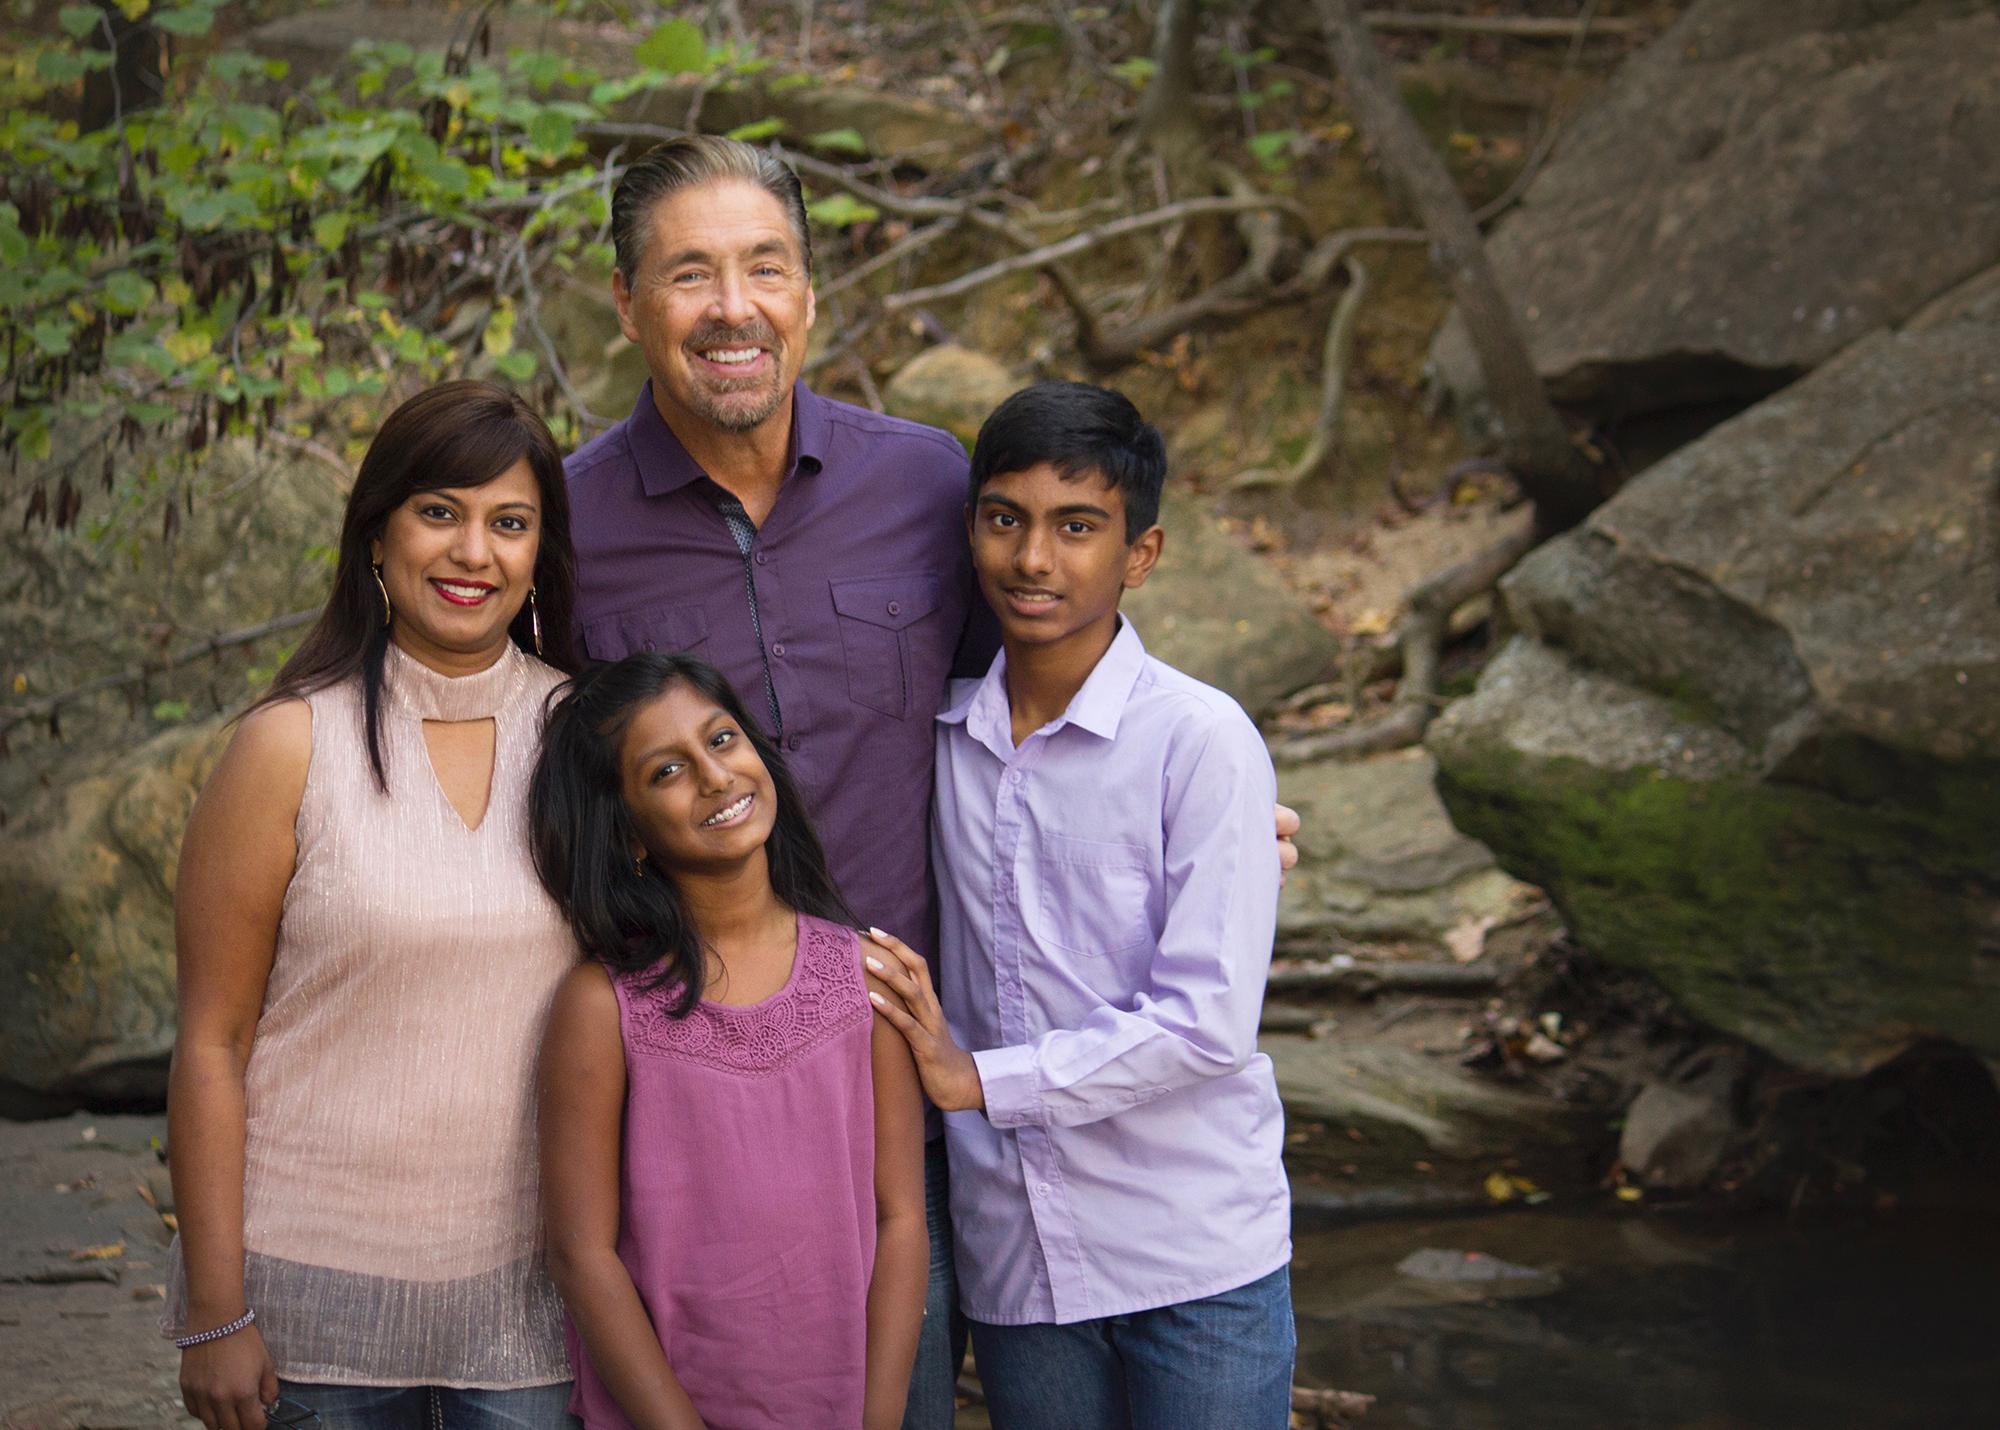 Leena's family